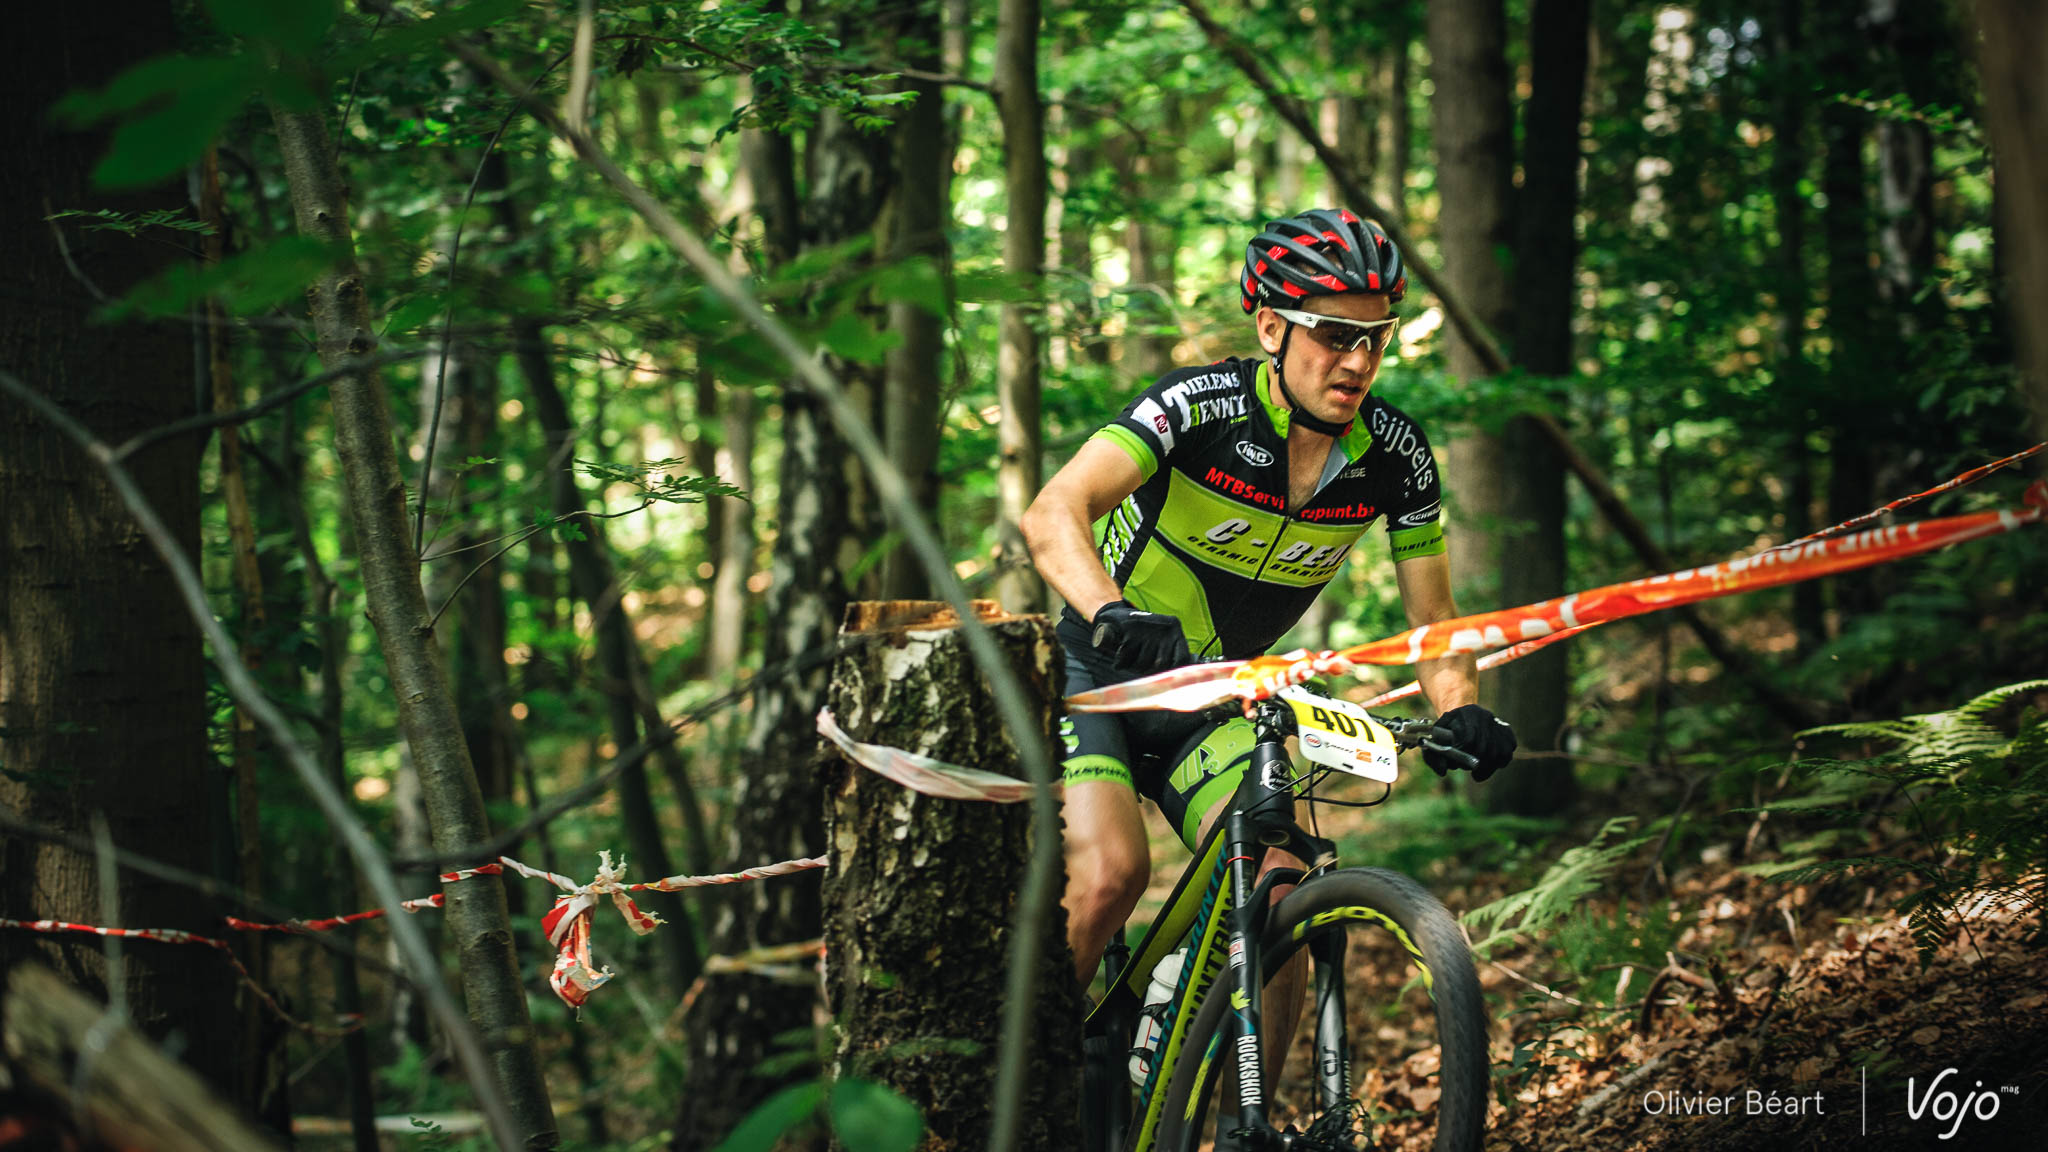 Championnat_Belgique_BK_XC_Master_Ottignies_2015_Copyright_OBeart_VojoMag-4